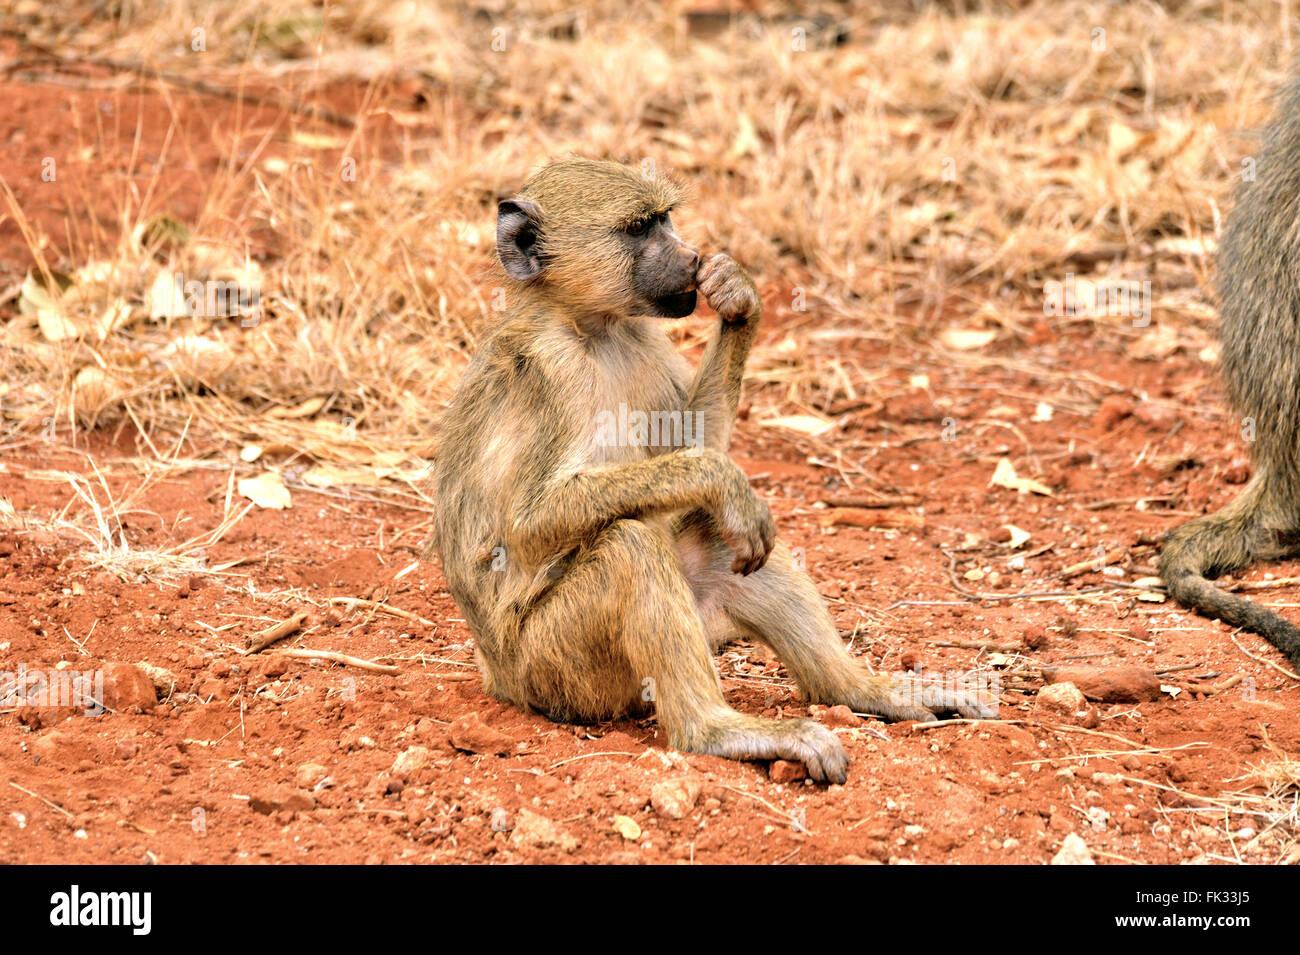 Yellow Baboon, Papio cynocephalus, looks bored and musing - Stock Image